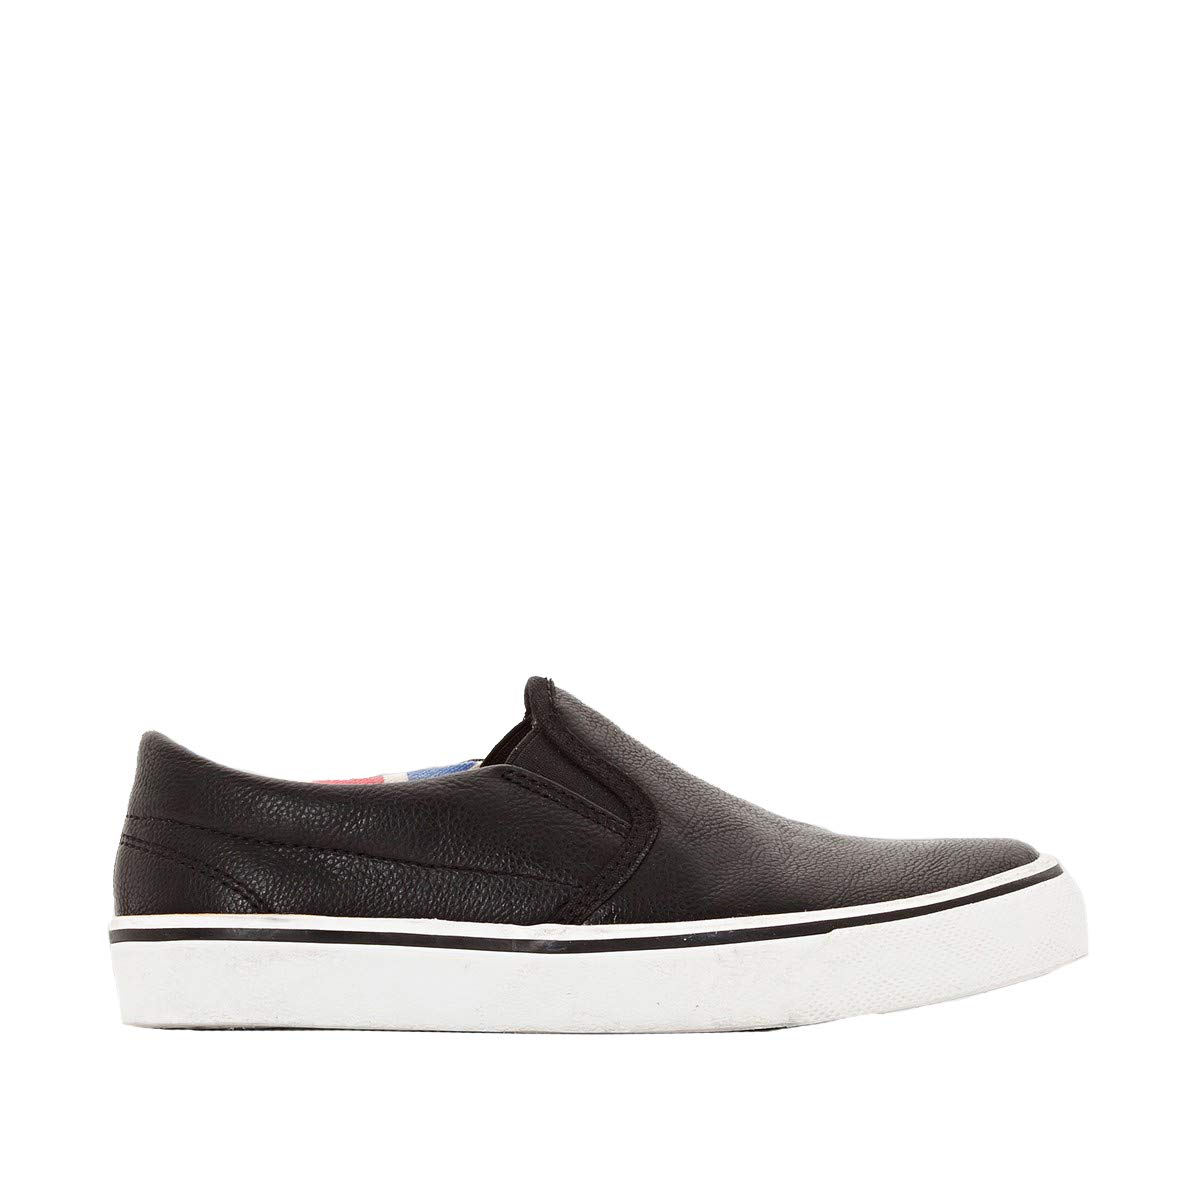 La Redoute Abcd'r Low Top Faux Grained Leather Plimsolls Black Size 29